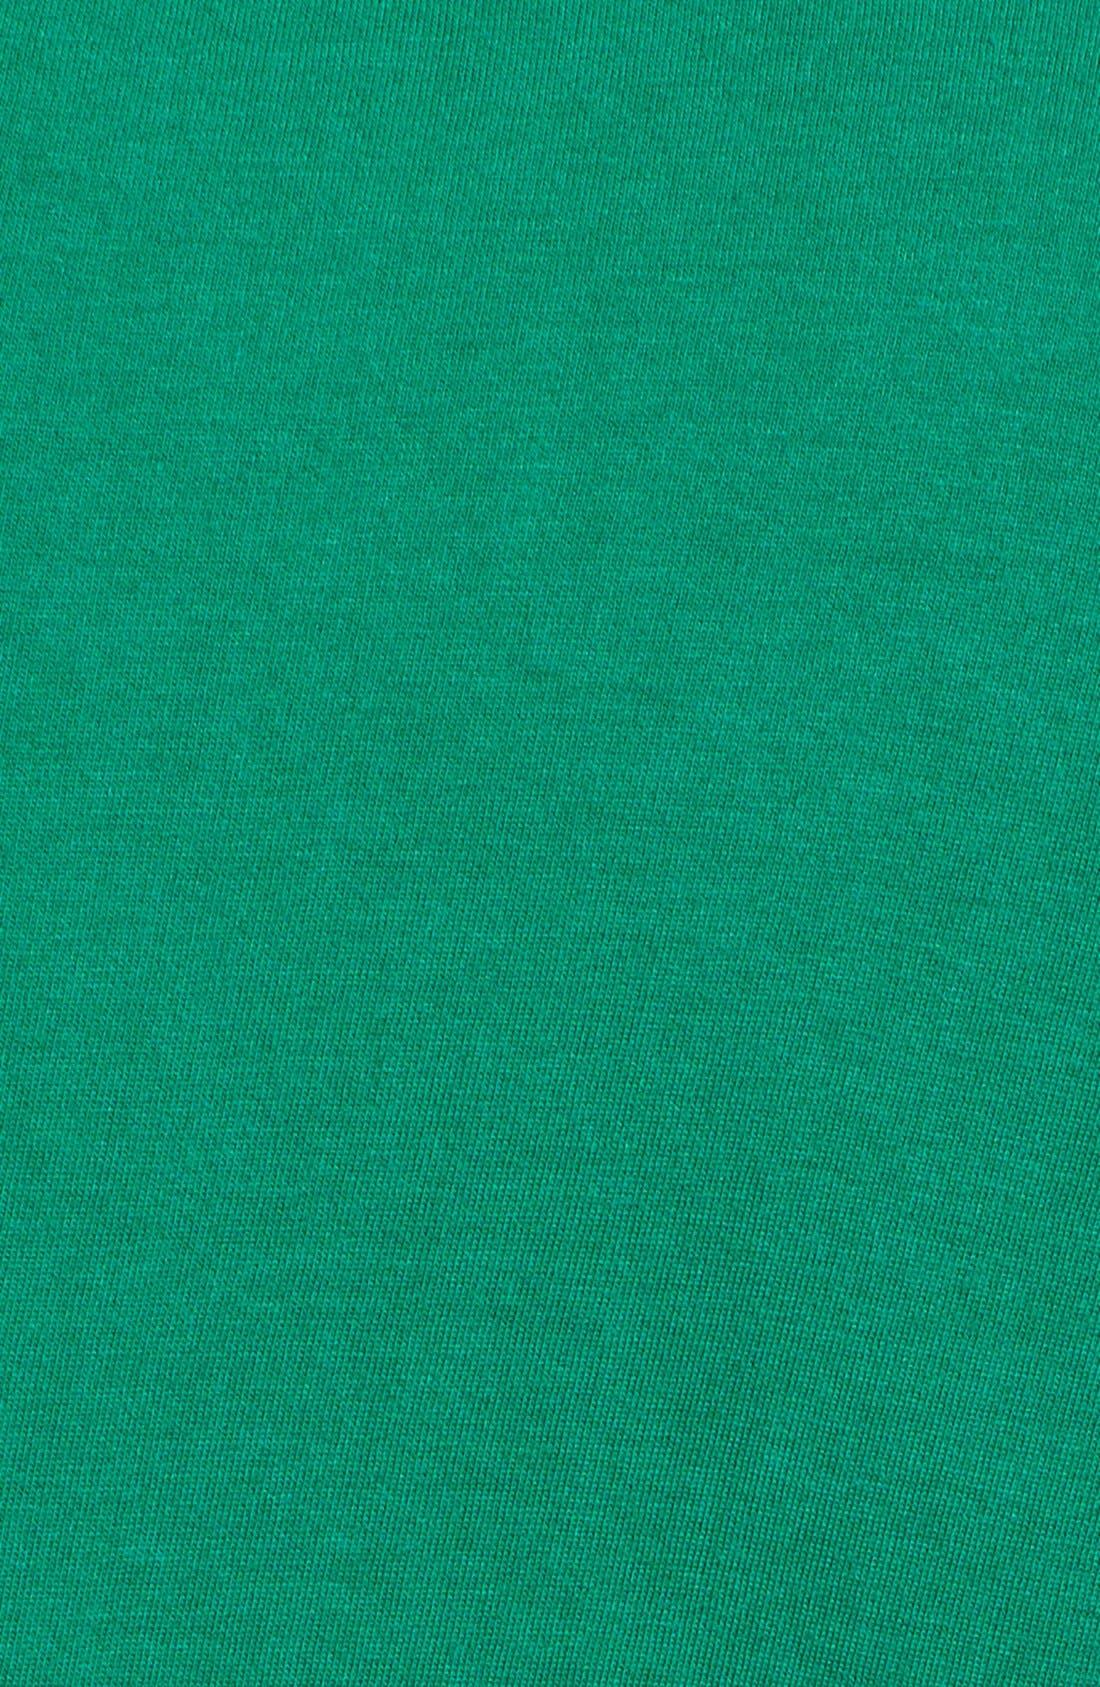 Alternate Image 3  - Red Jacket 'Brass Tacks - Guinness' Cotton T-Shirt